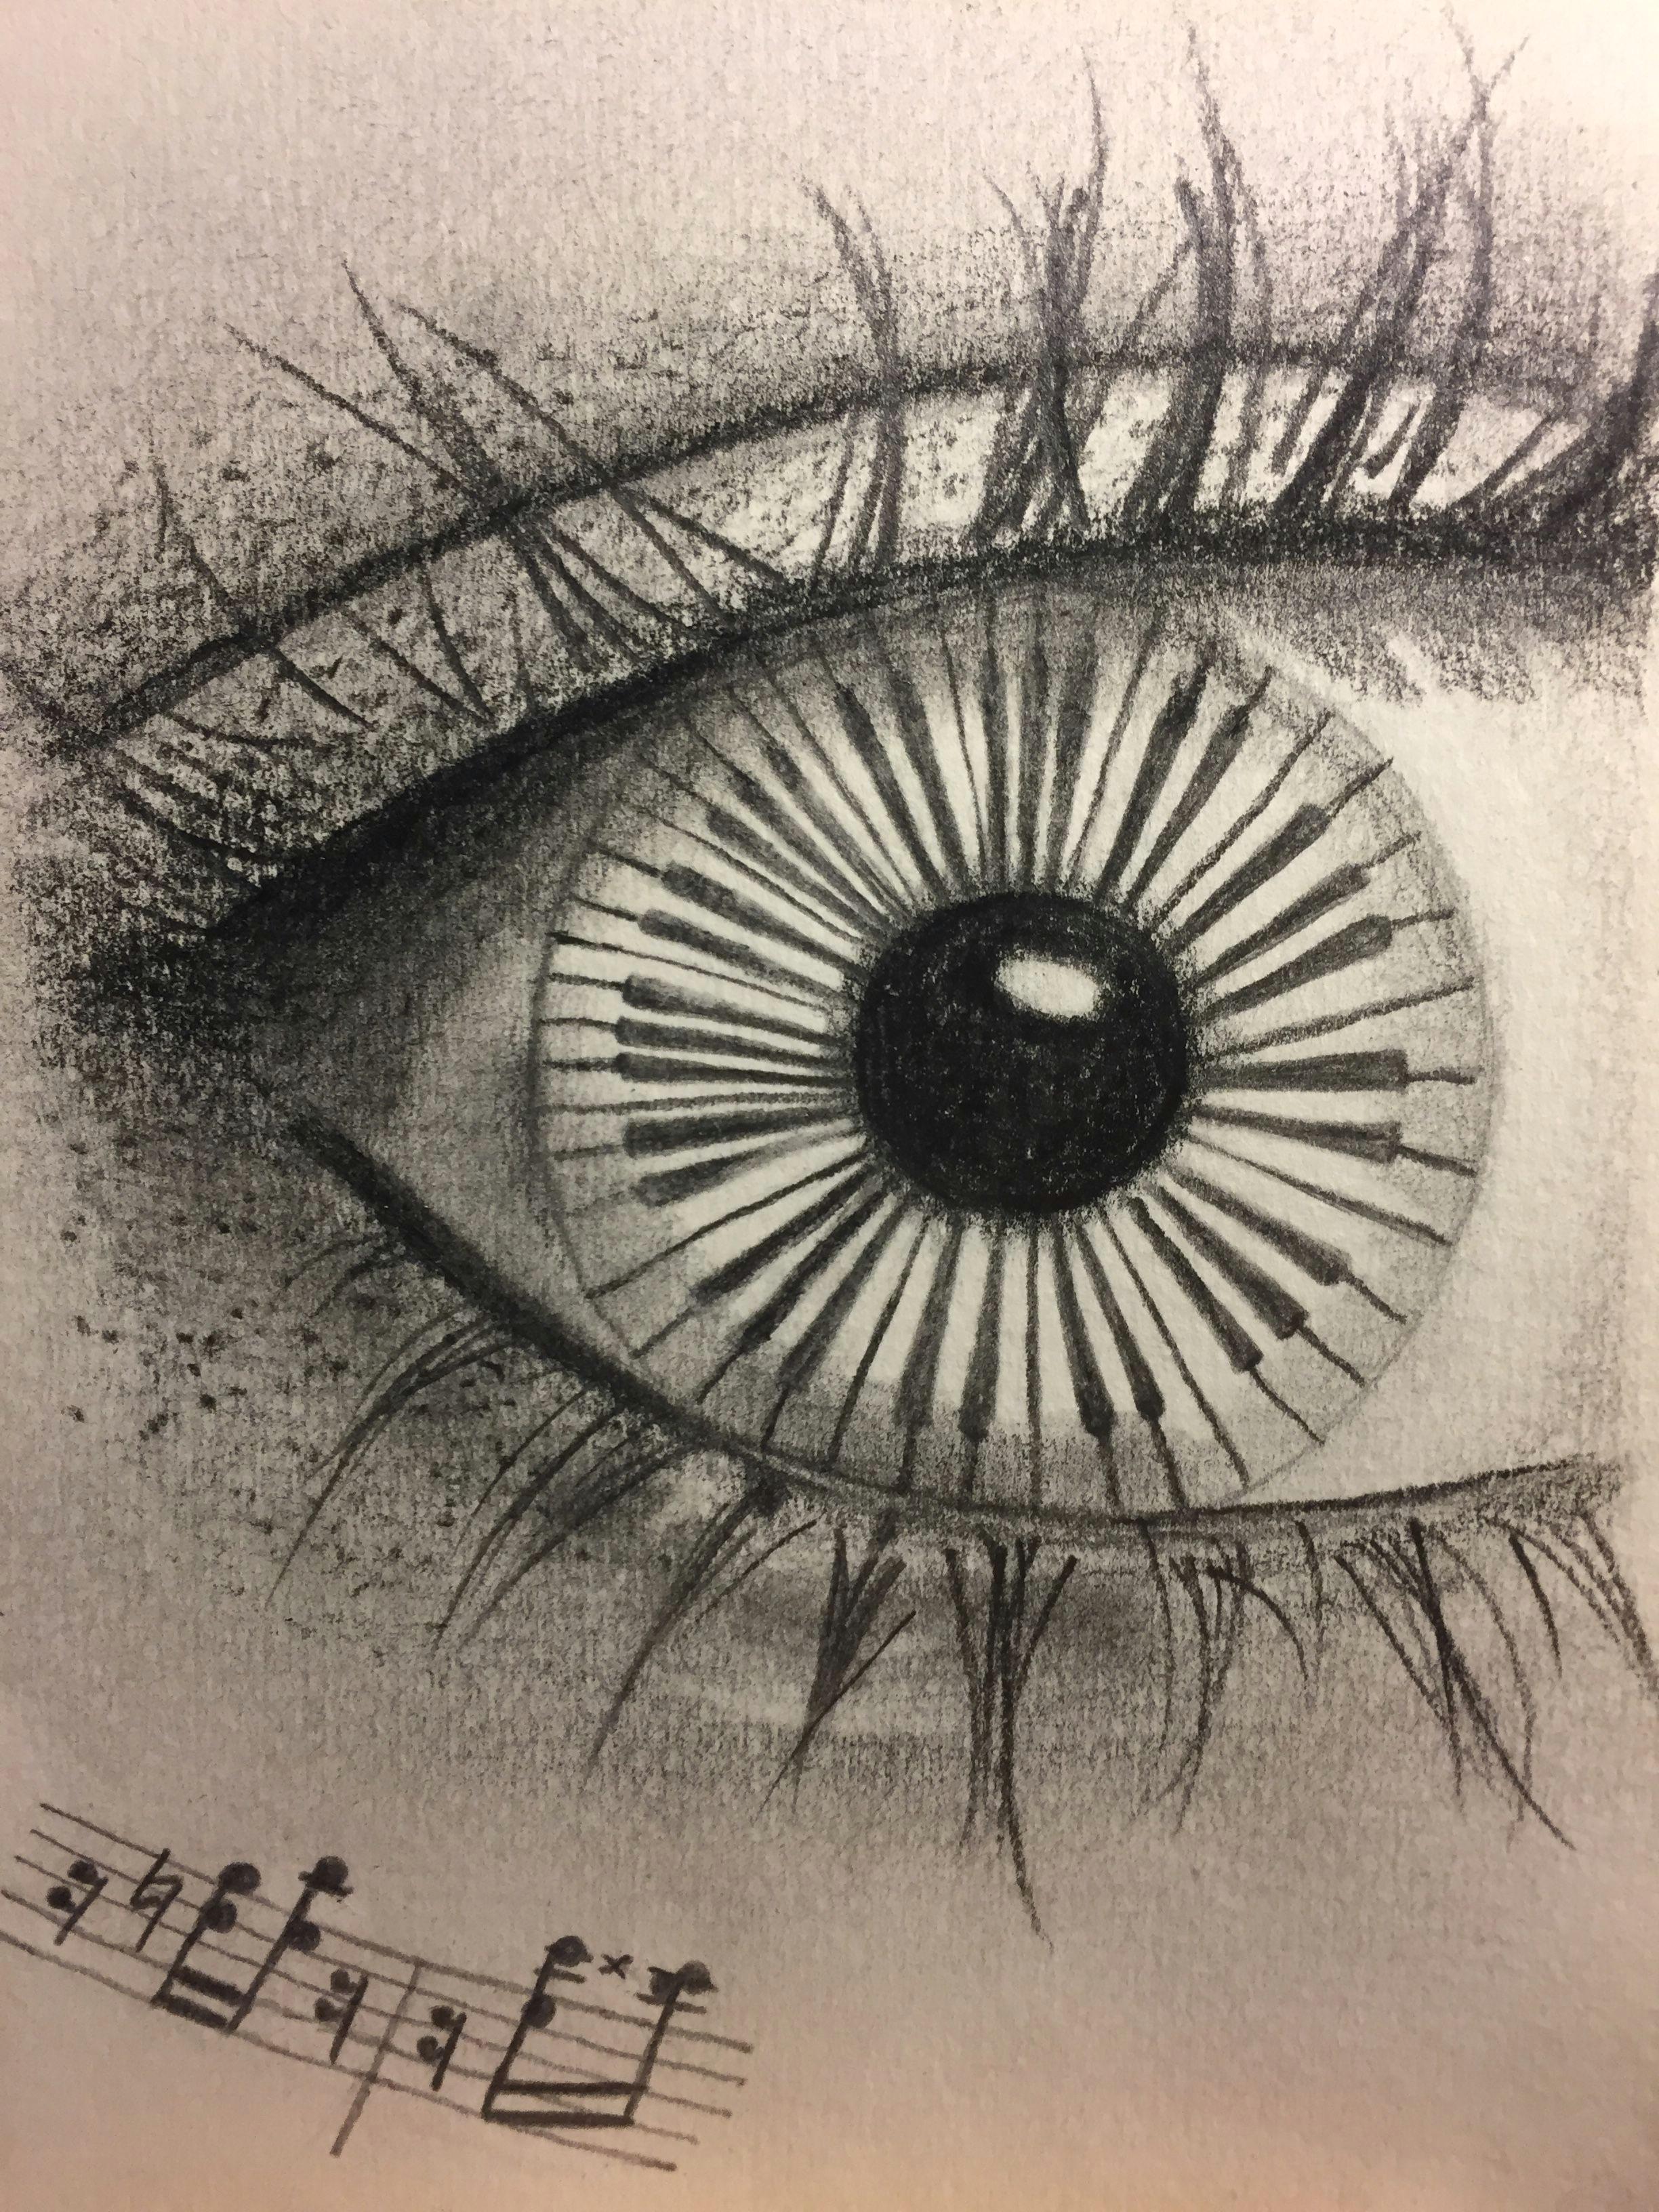 musical eye sketch